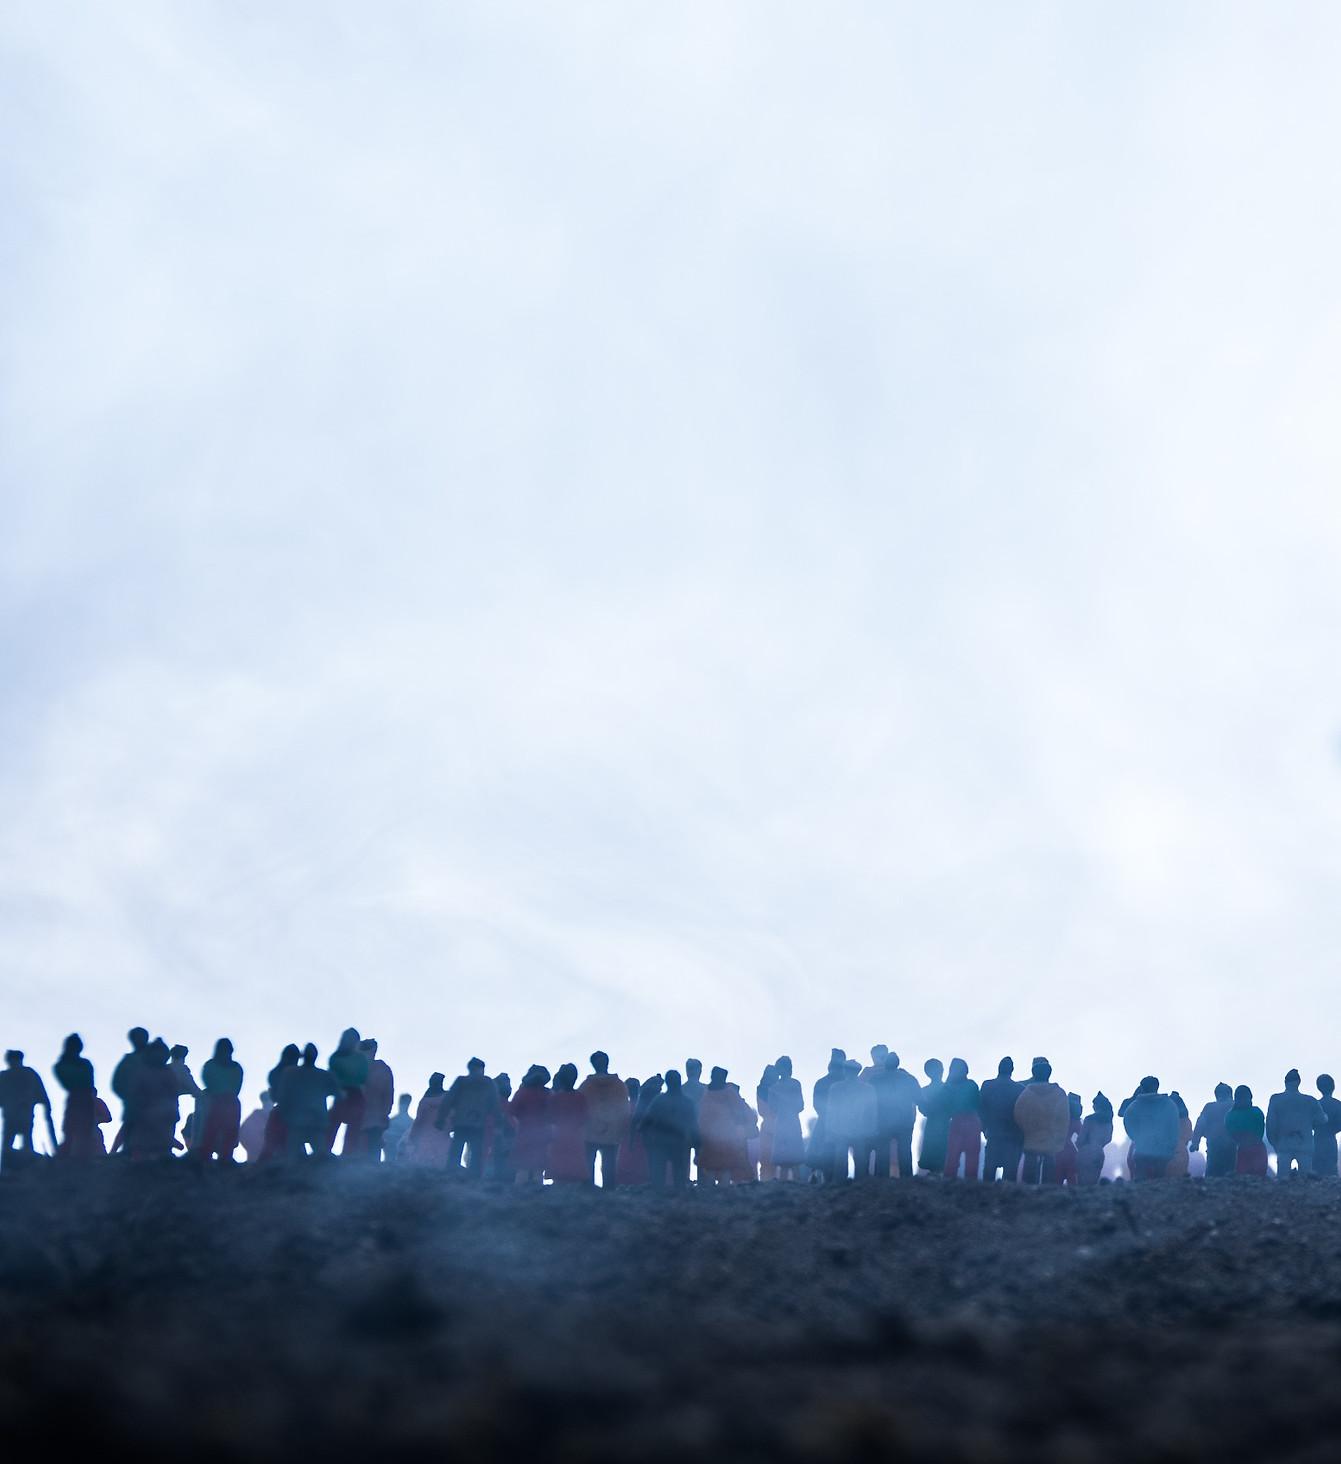 103138838-blurred-silhouette-giant-monst